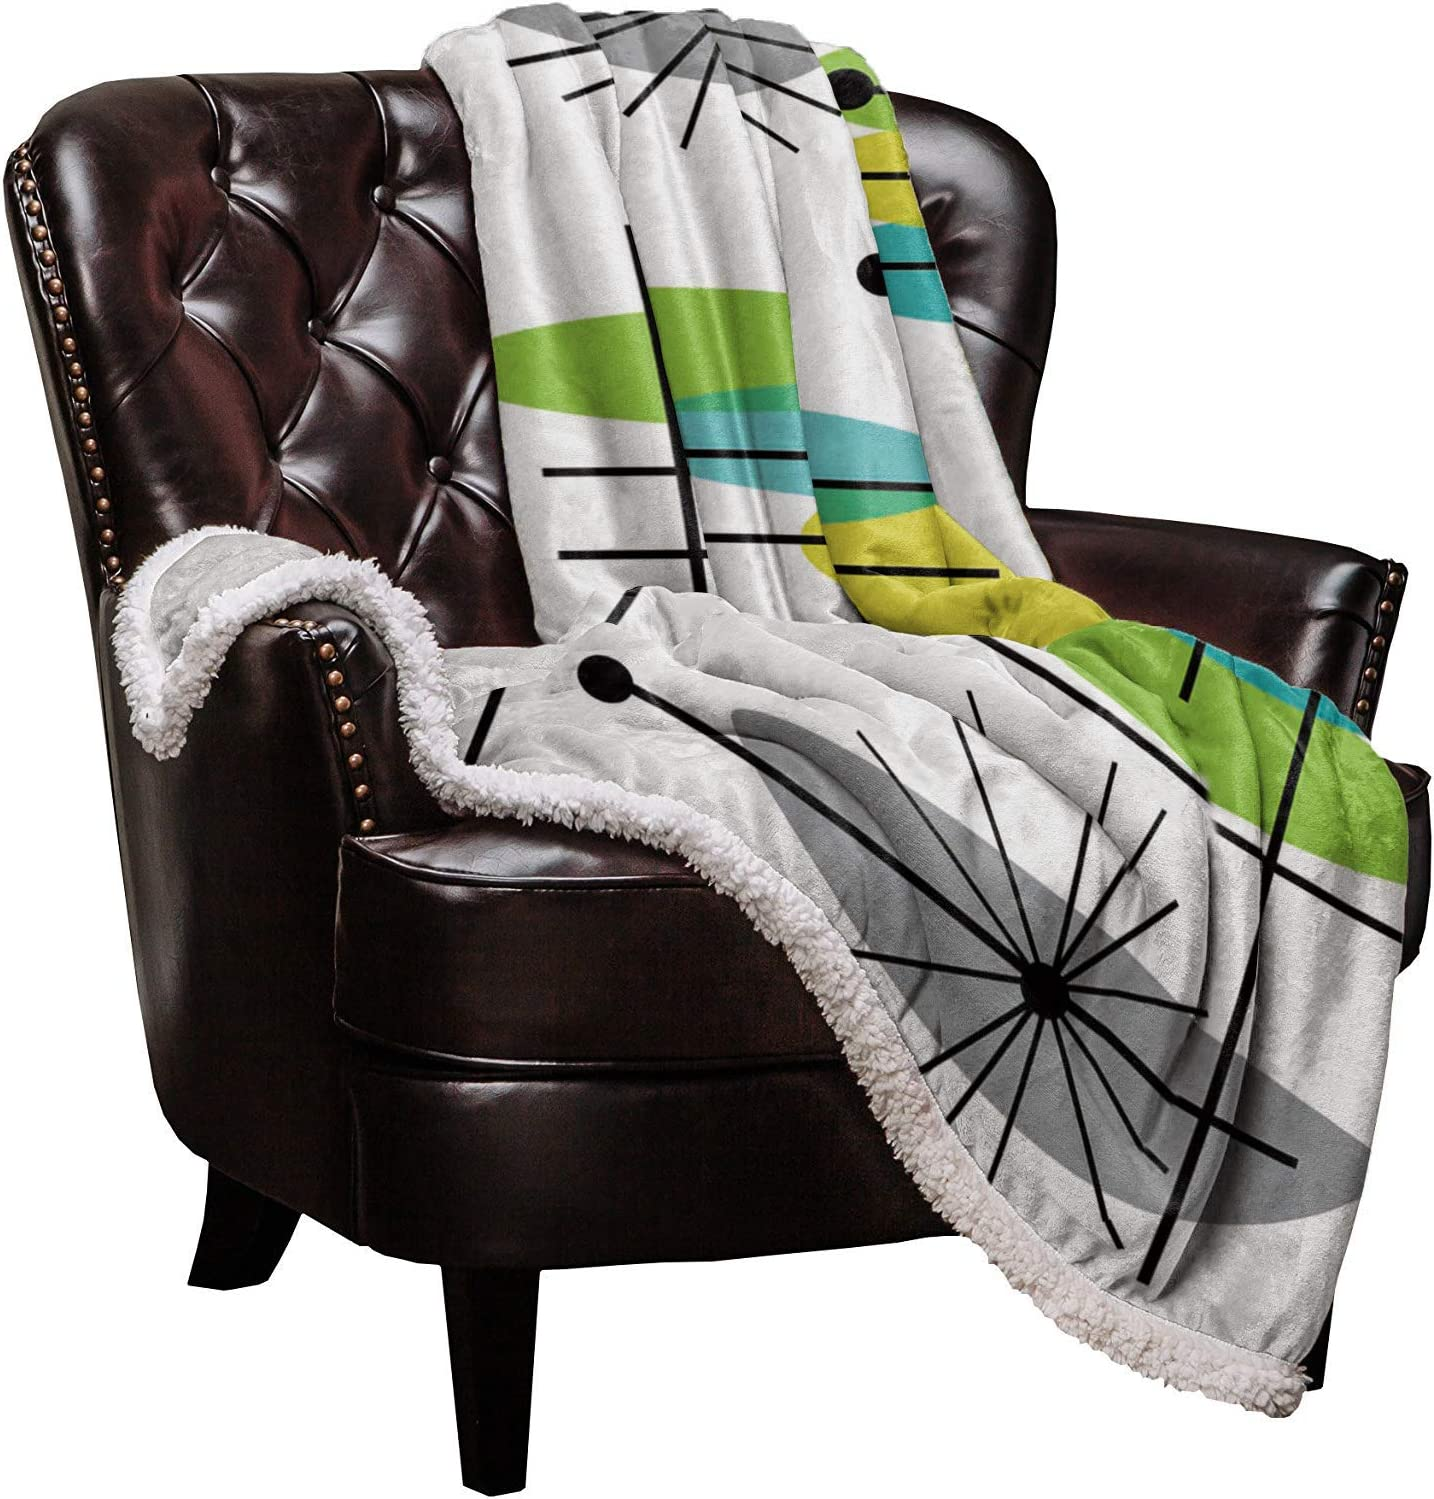 Big buy store Sherpa Flannel Throw L お買い得品 Blankets Modern Mid 2020A/W新作送料無料 Century